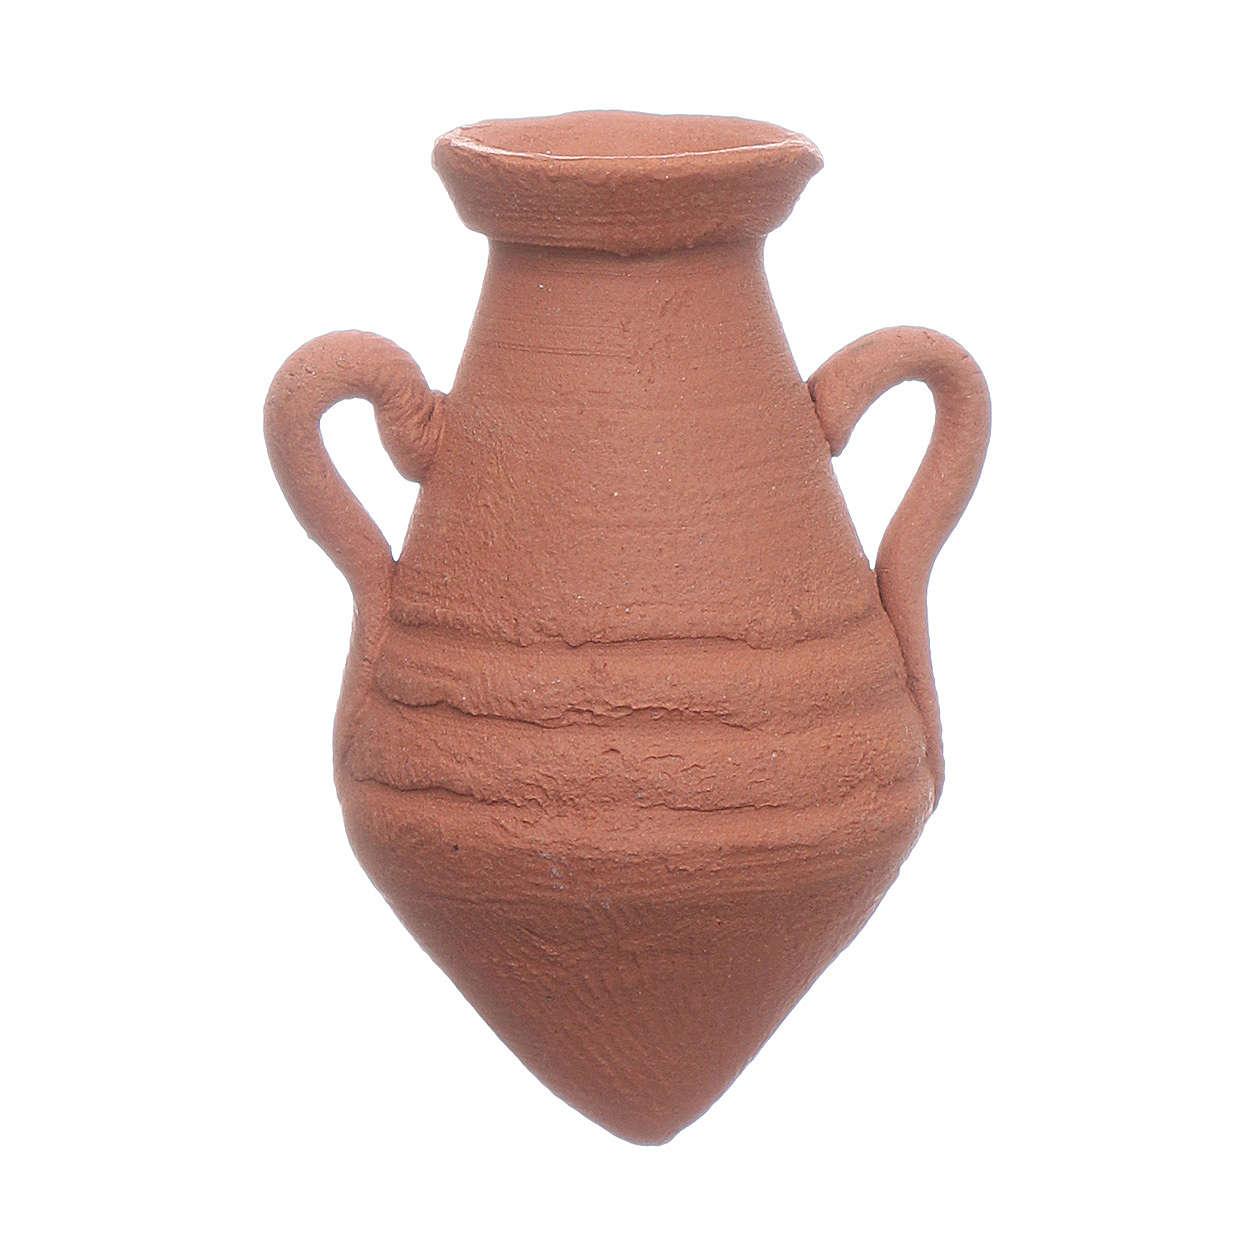 Terracotta amphora assorted models 3,5x3 cm 4